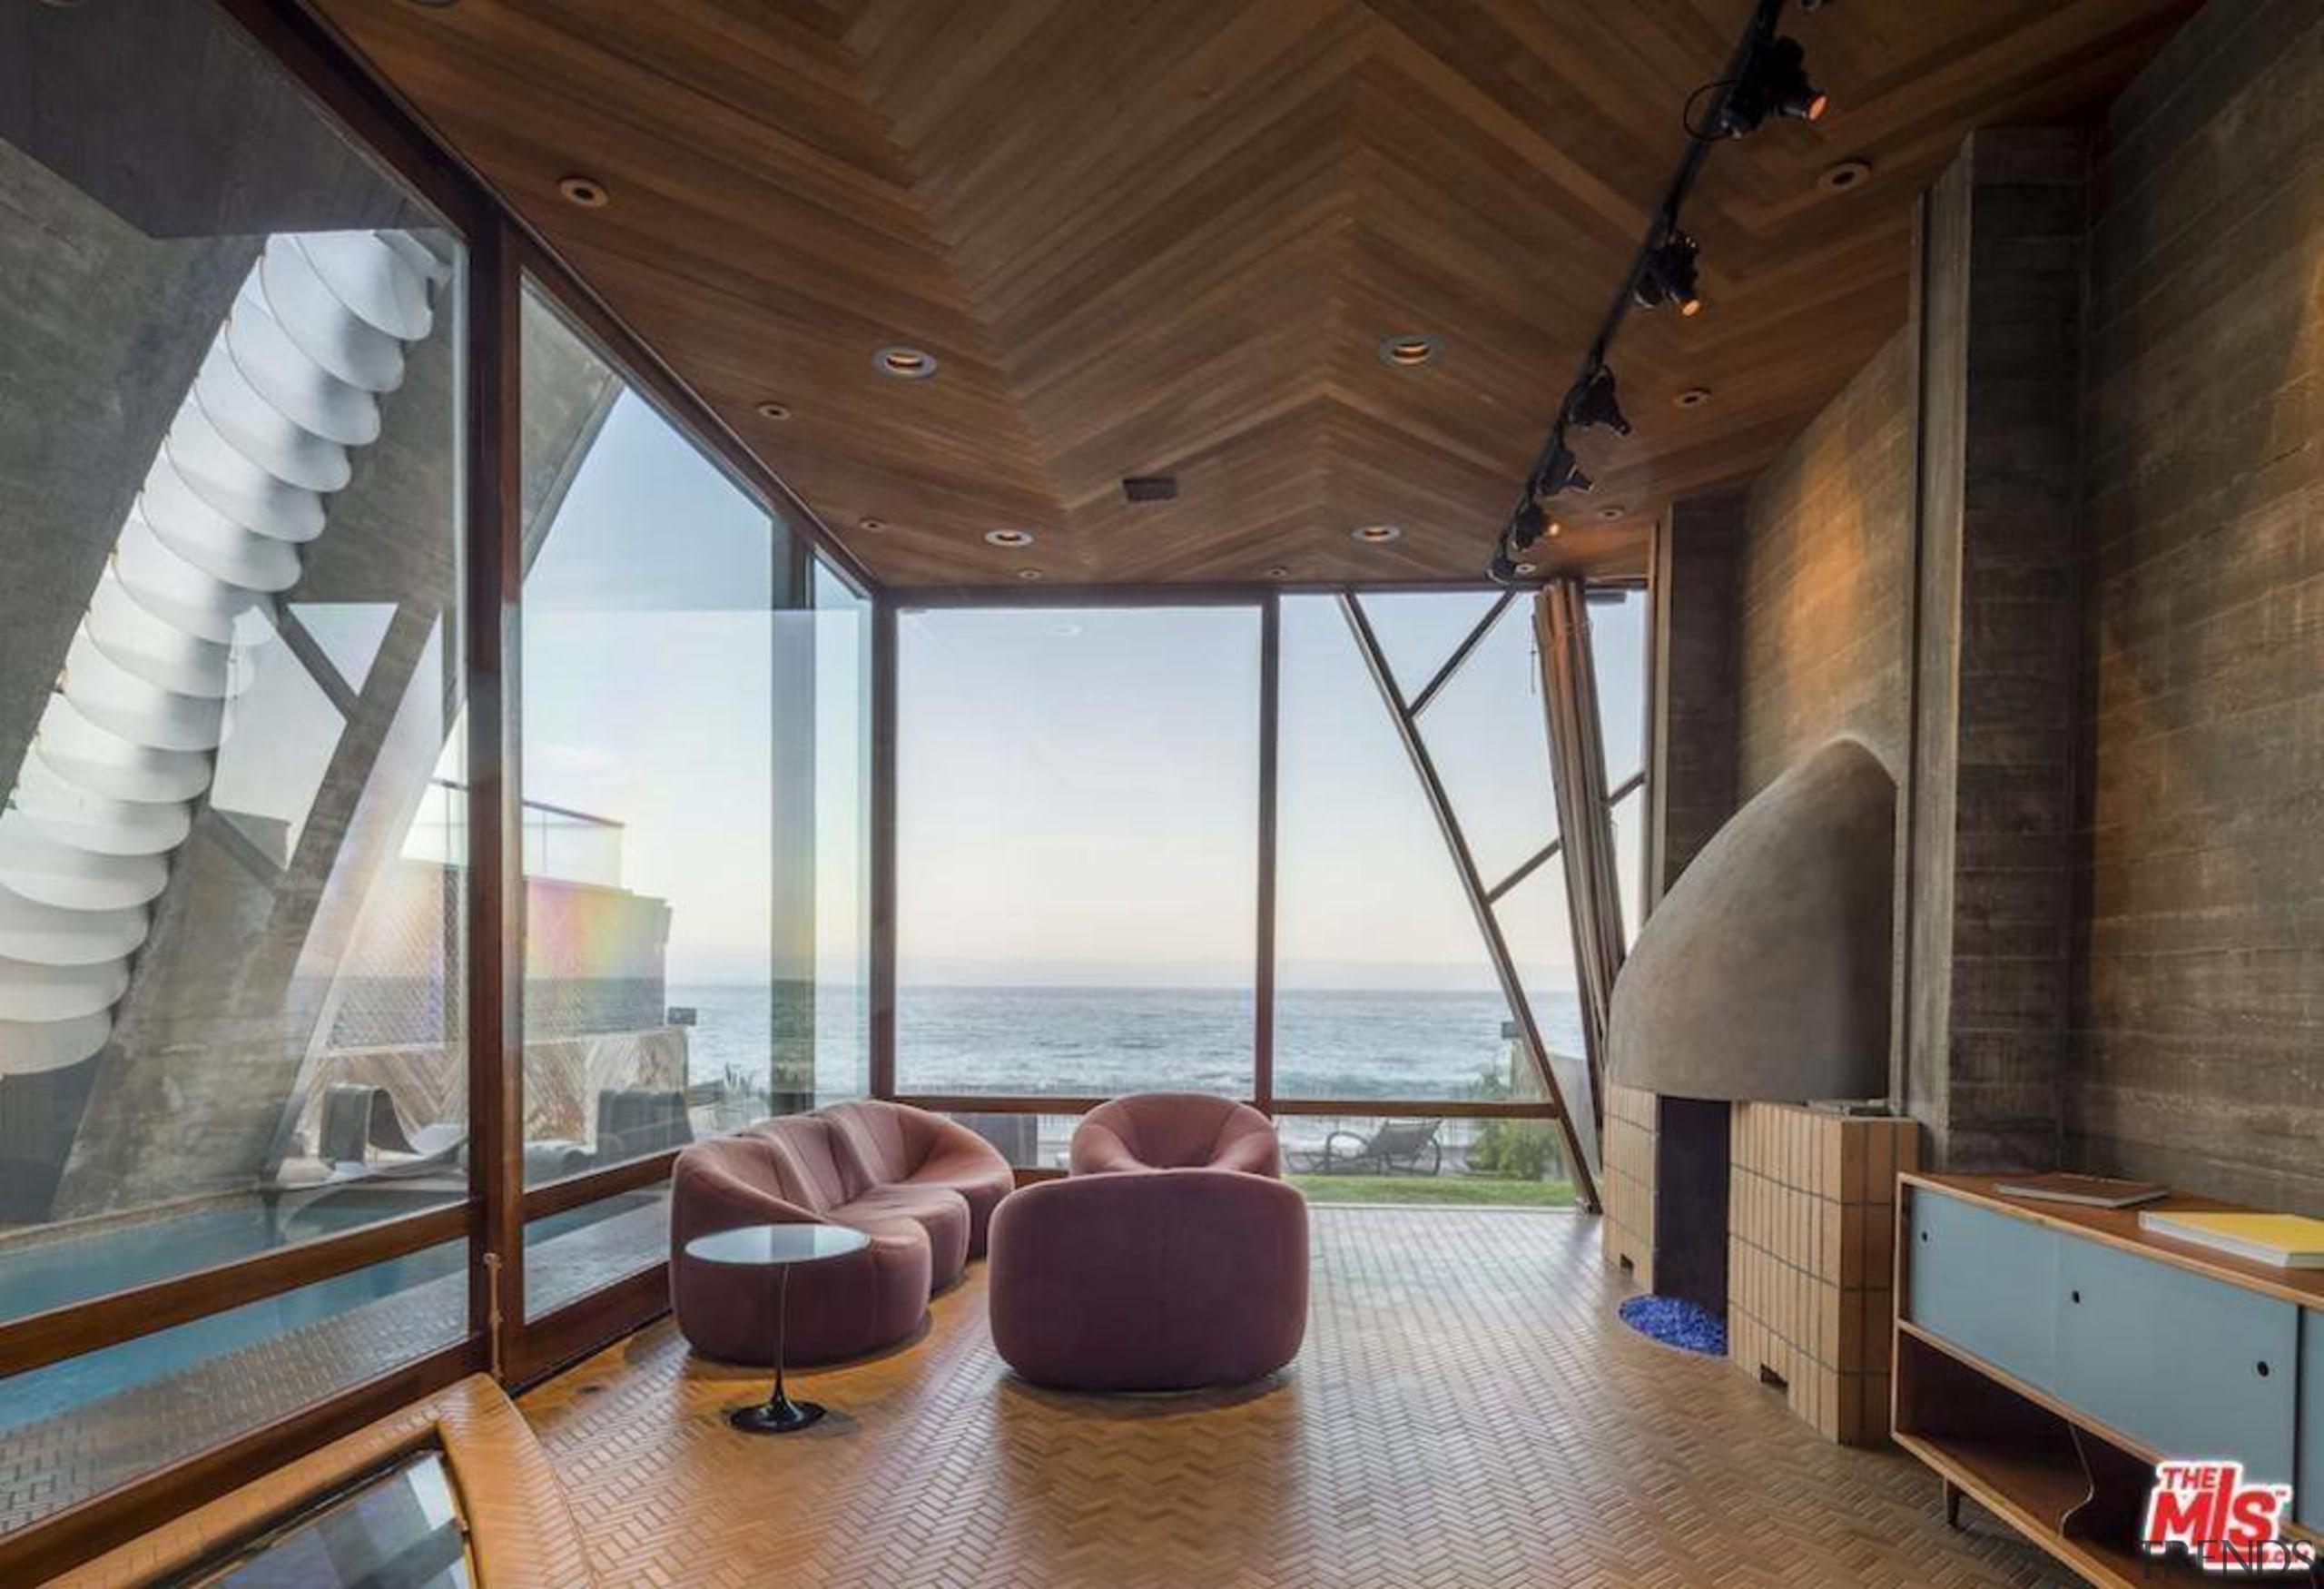 Edward Norton's new Malibu Colony home – Trulia architecture, ceiling, house, interior design, real estate, window, wood, brown, gray